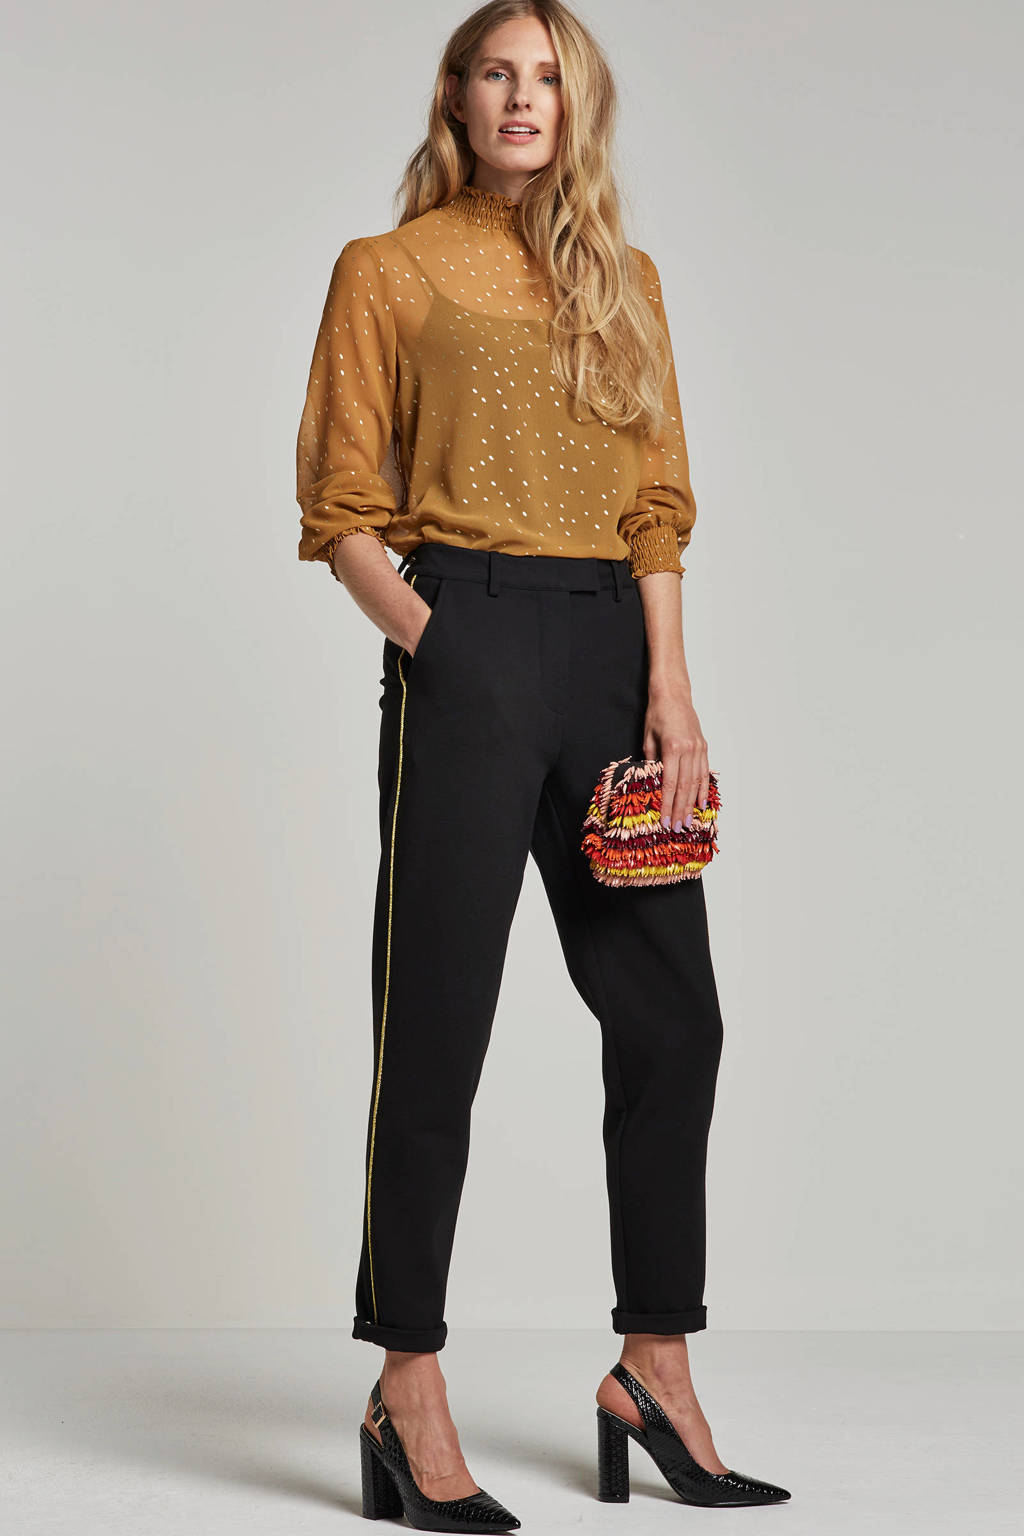 NUMPH regular fit broek met glitters, Zwart/goud